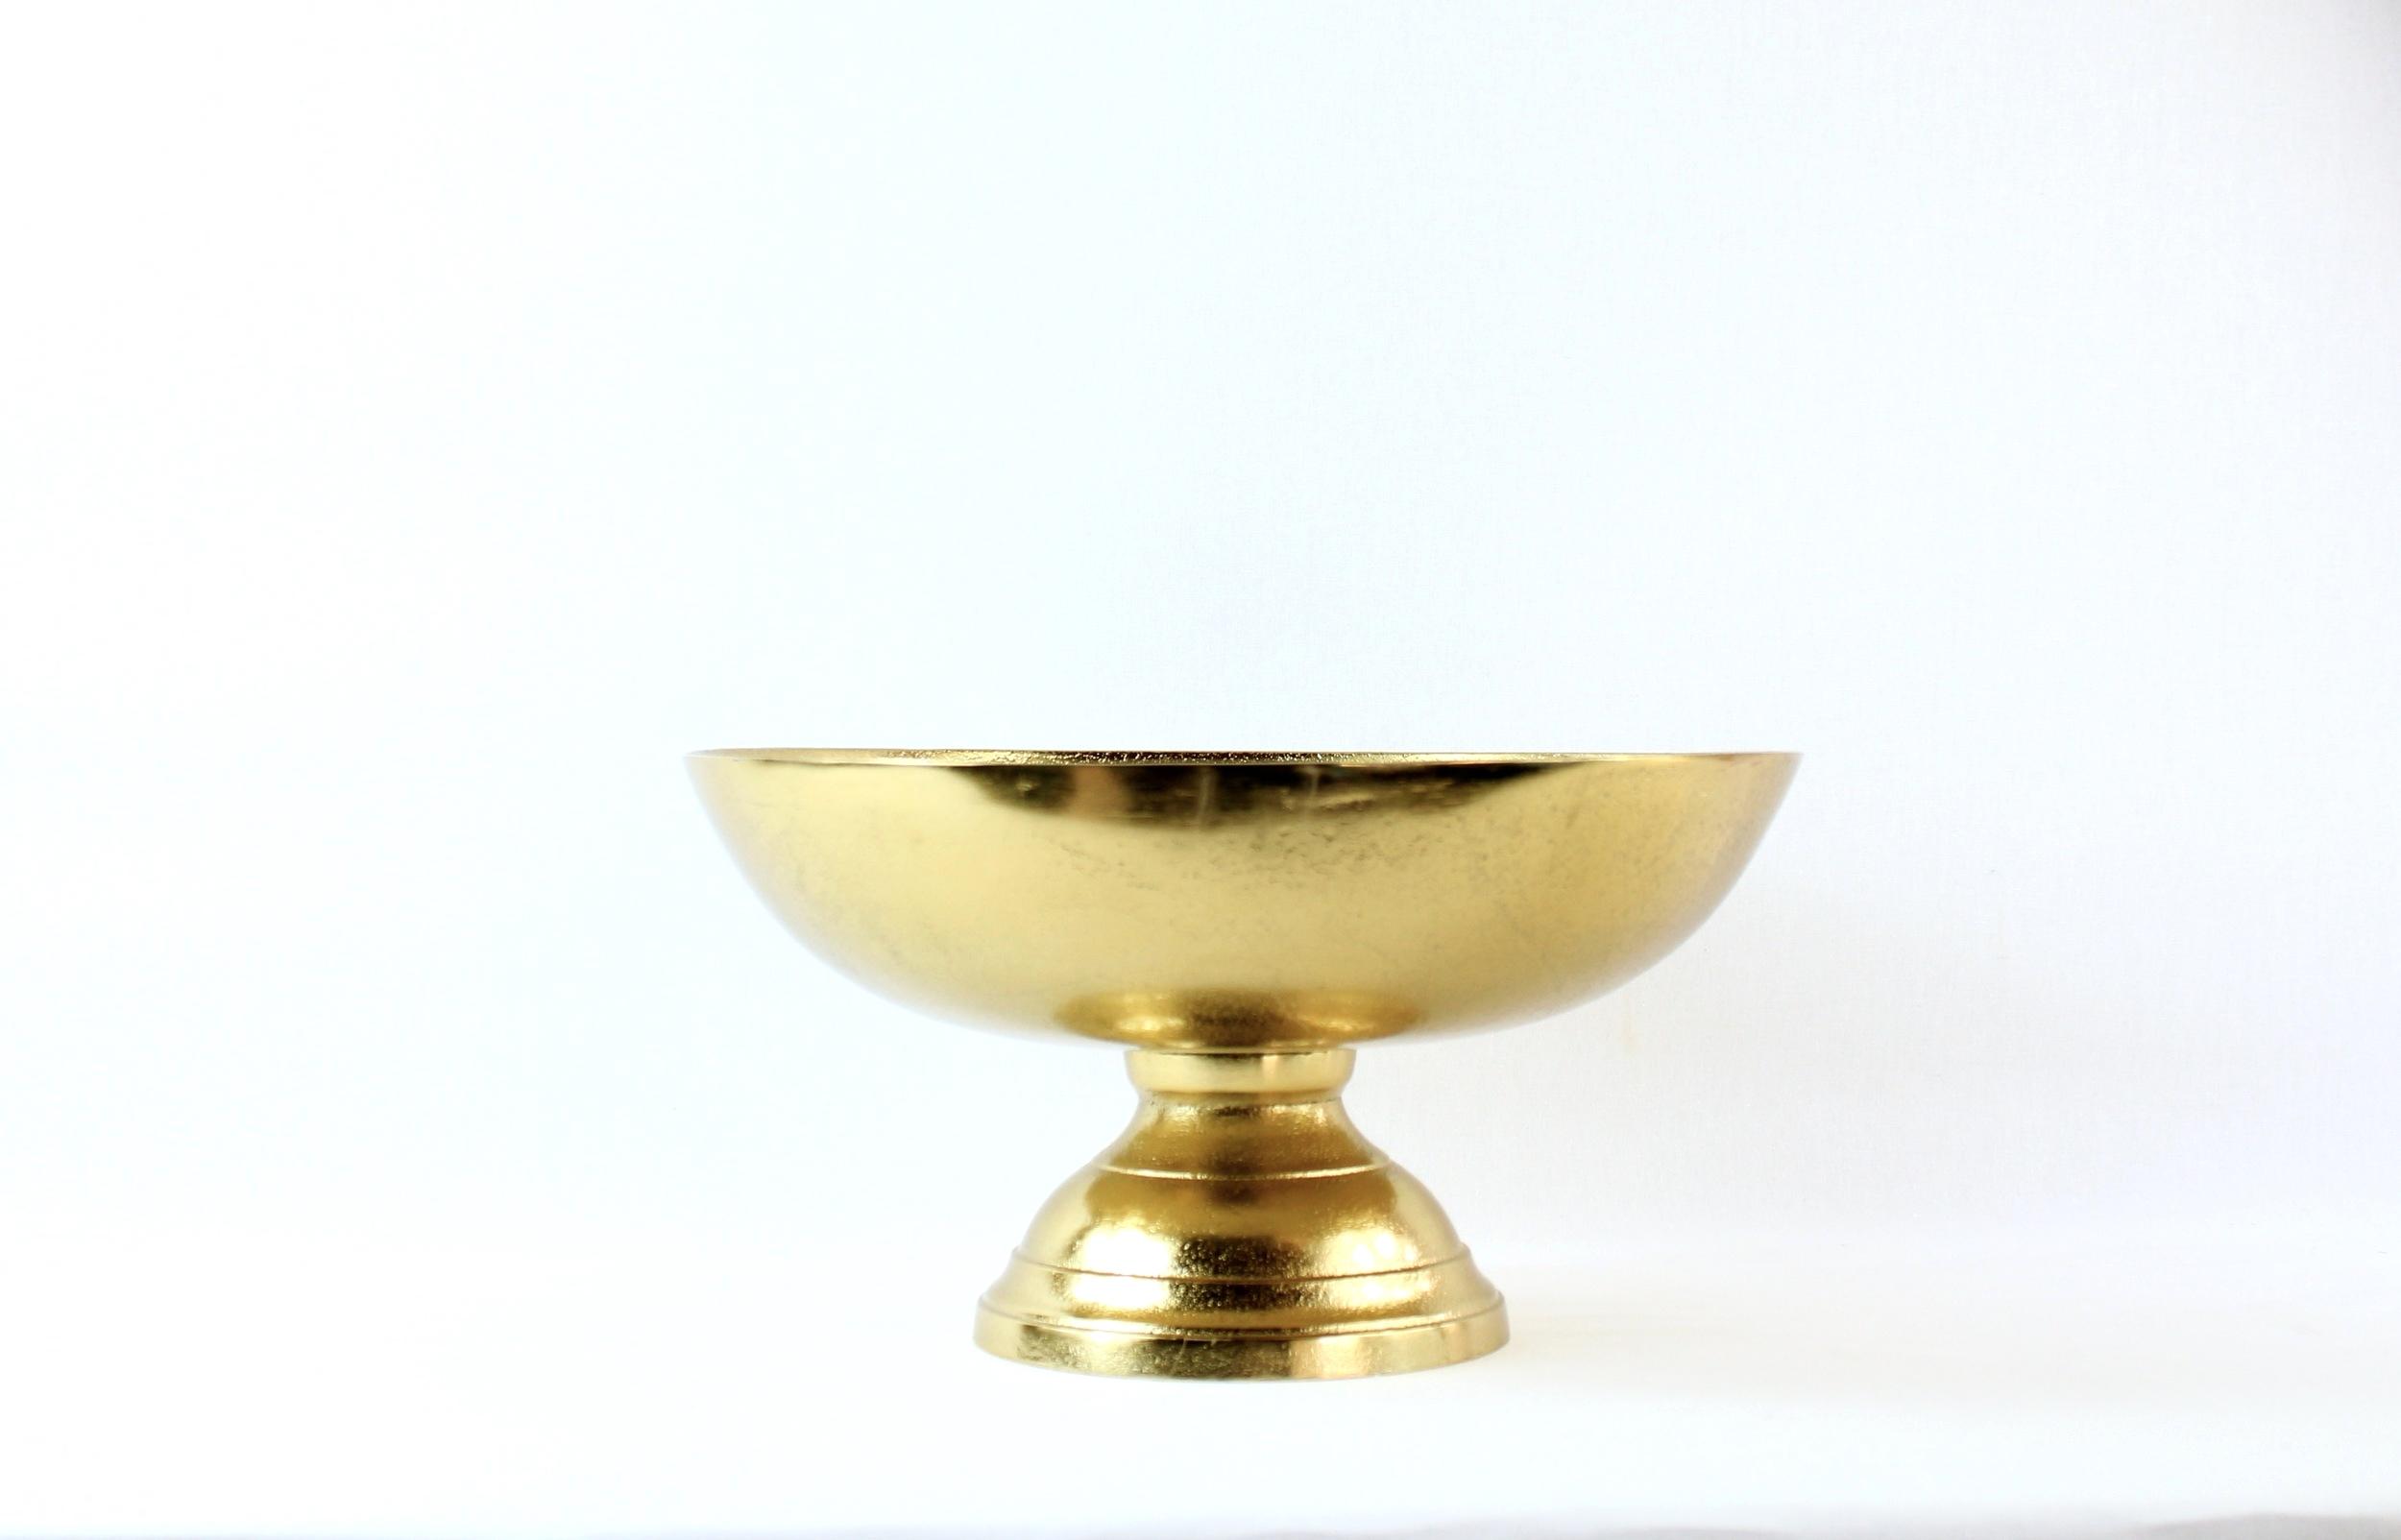 Gold Pedestal Bowls